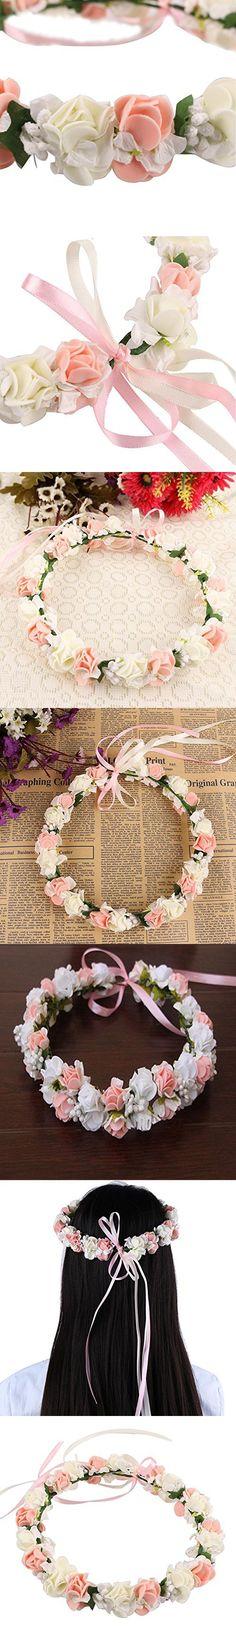 Ele Fanamskl Bridal Floral Wreath ith Adjustable Ribbon for Wedding Festivals